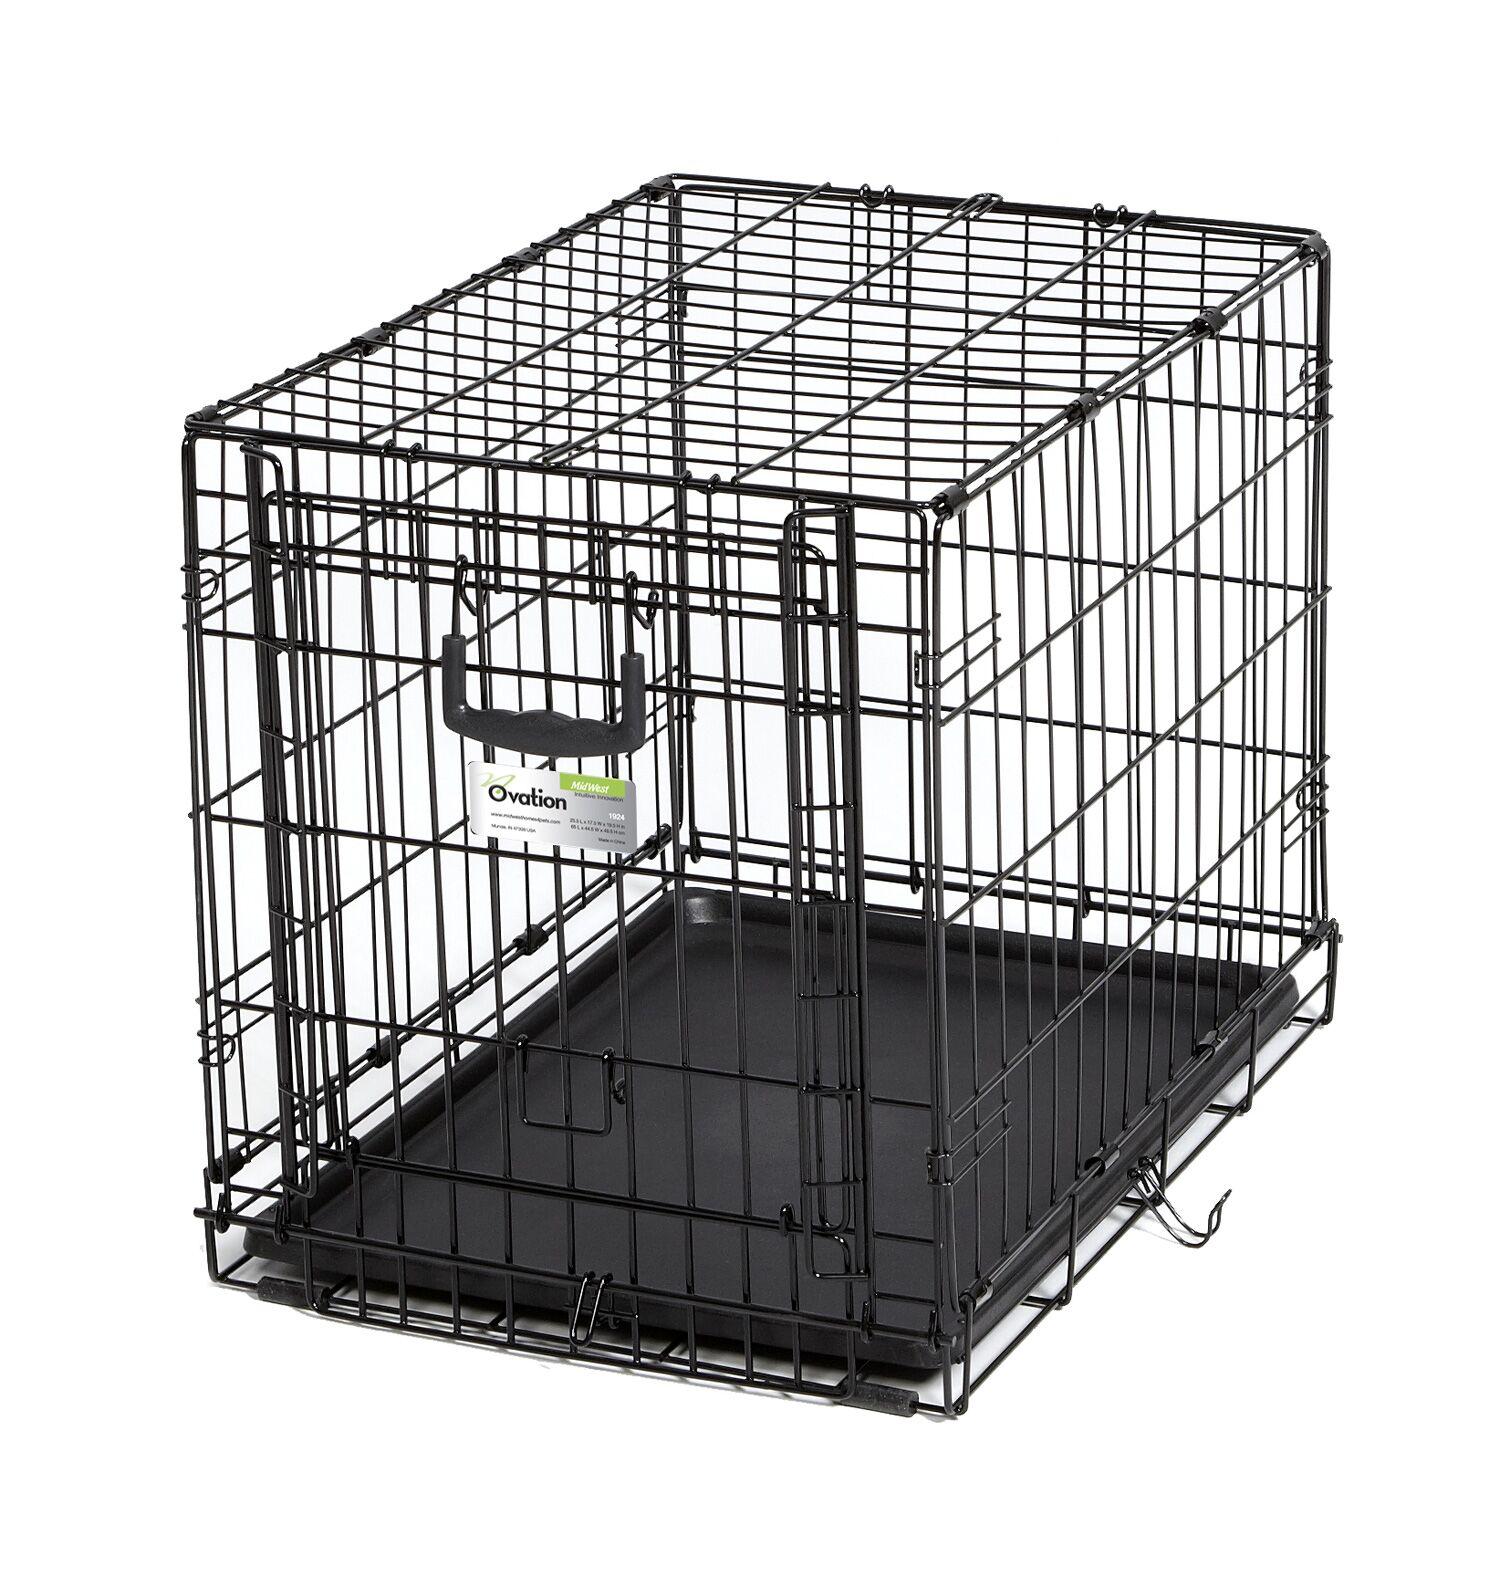 Ovation Single Door Pet Crate Size: 24